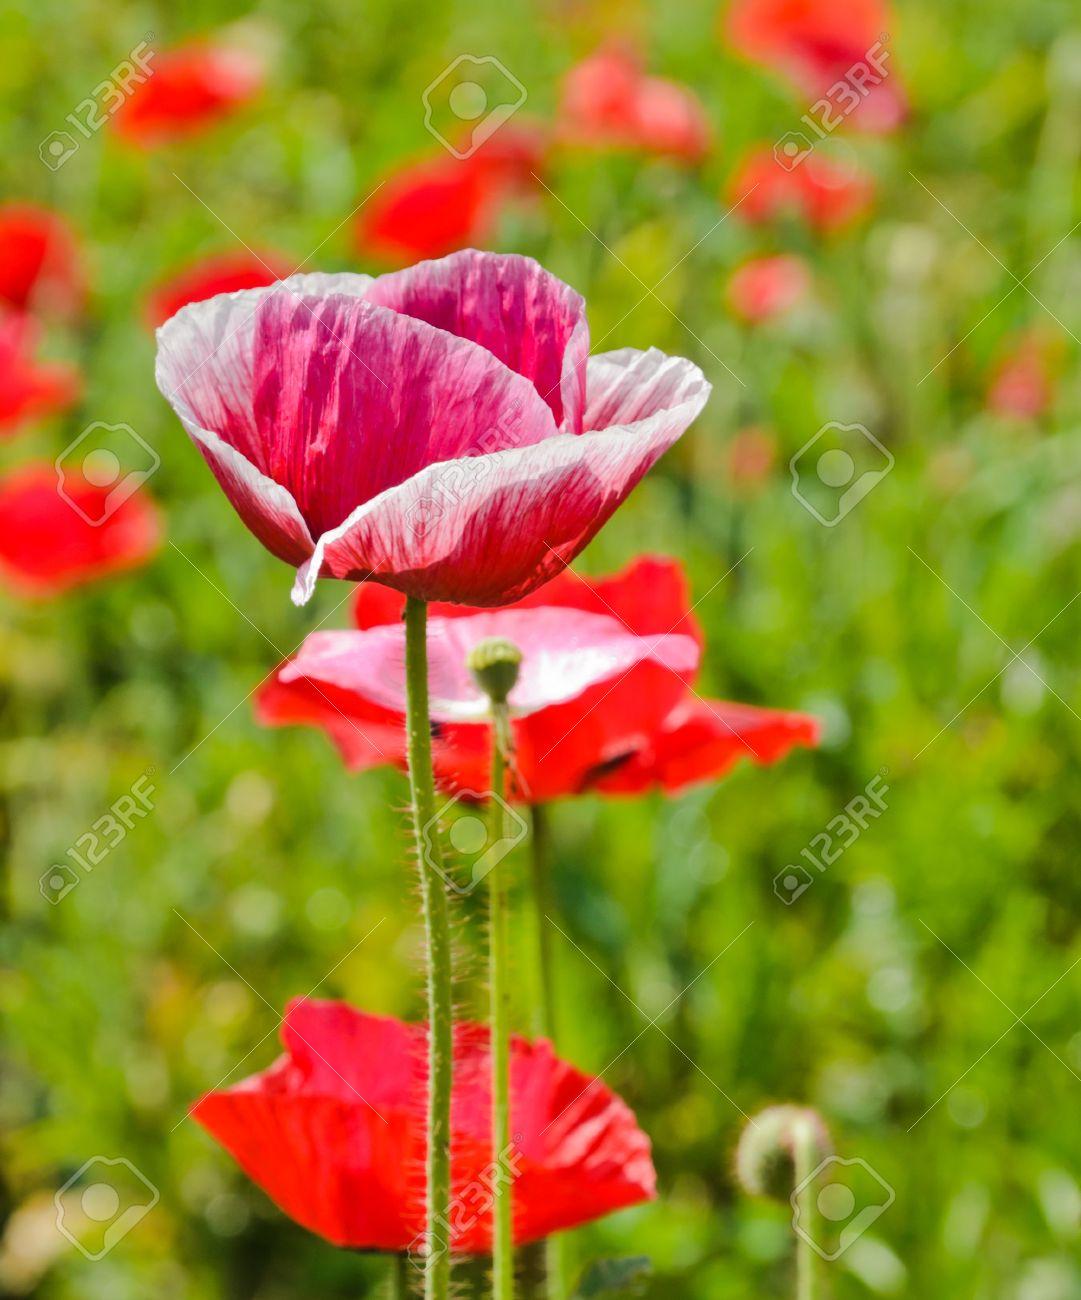 Opium poppy flower in field stock photo picture and royalty free opium poppy flower in field stock photo 17628003 mightylinksfo